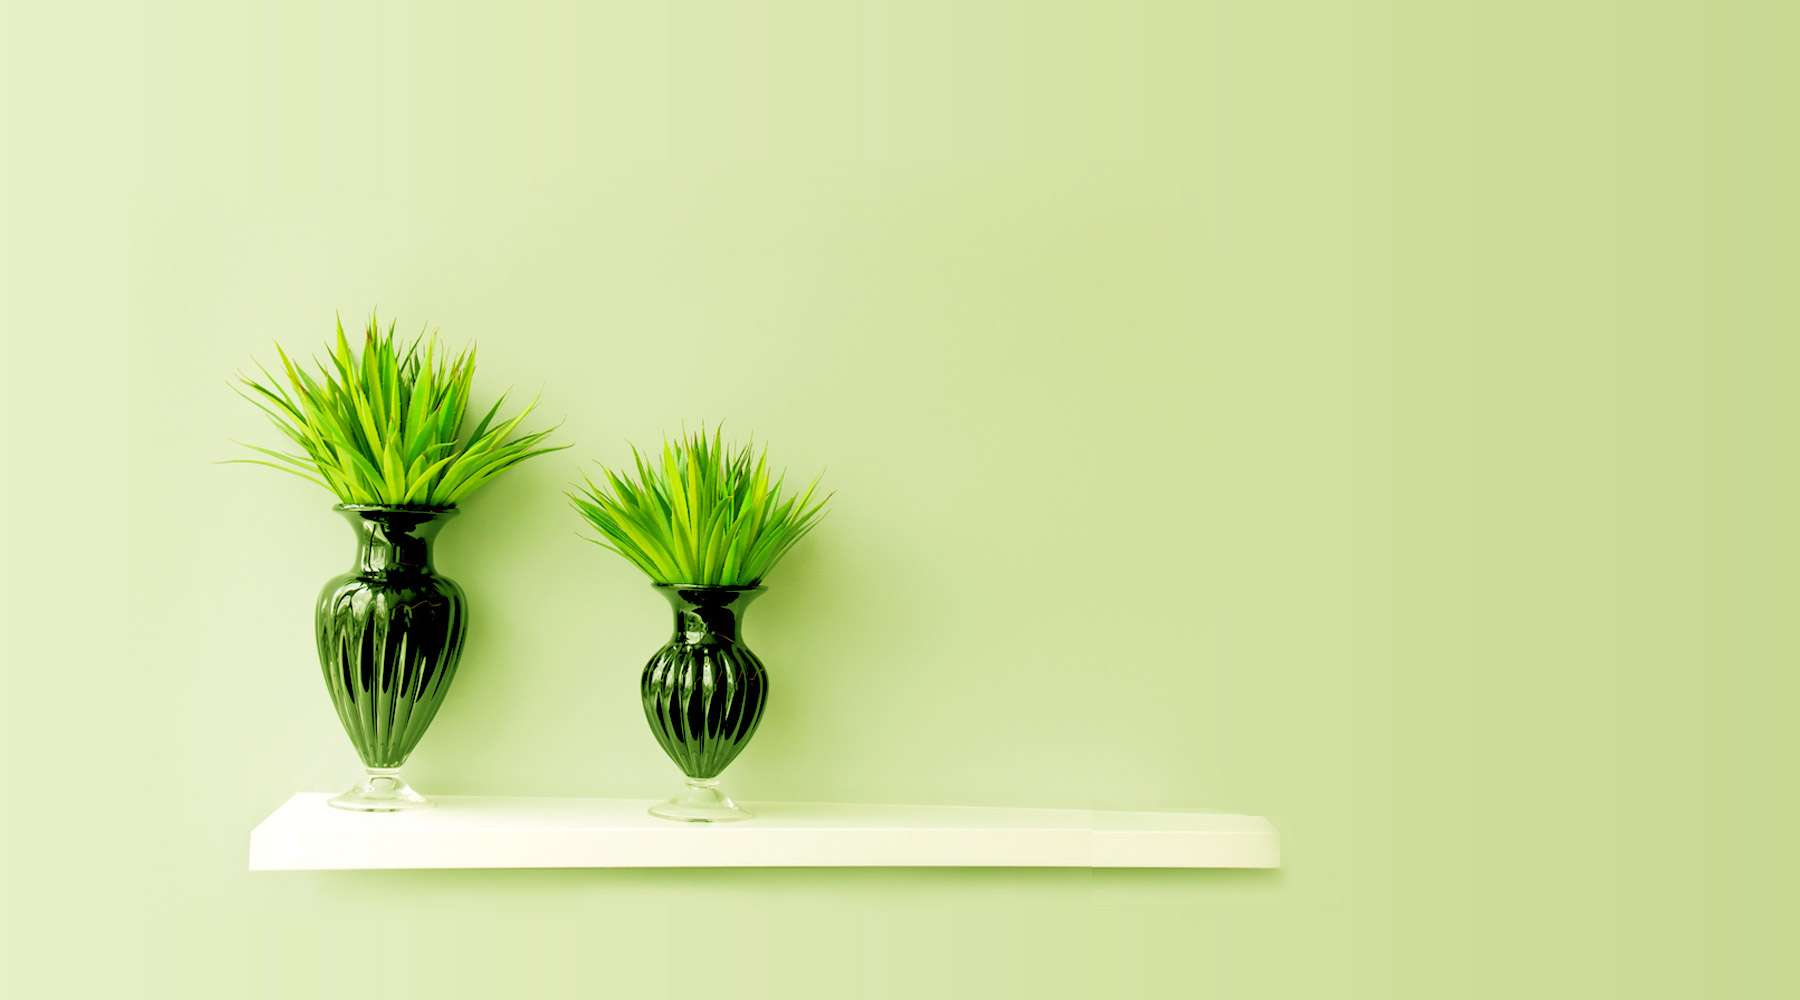 garden-center-marketing-site-affordable-pricing-bg